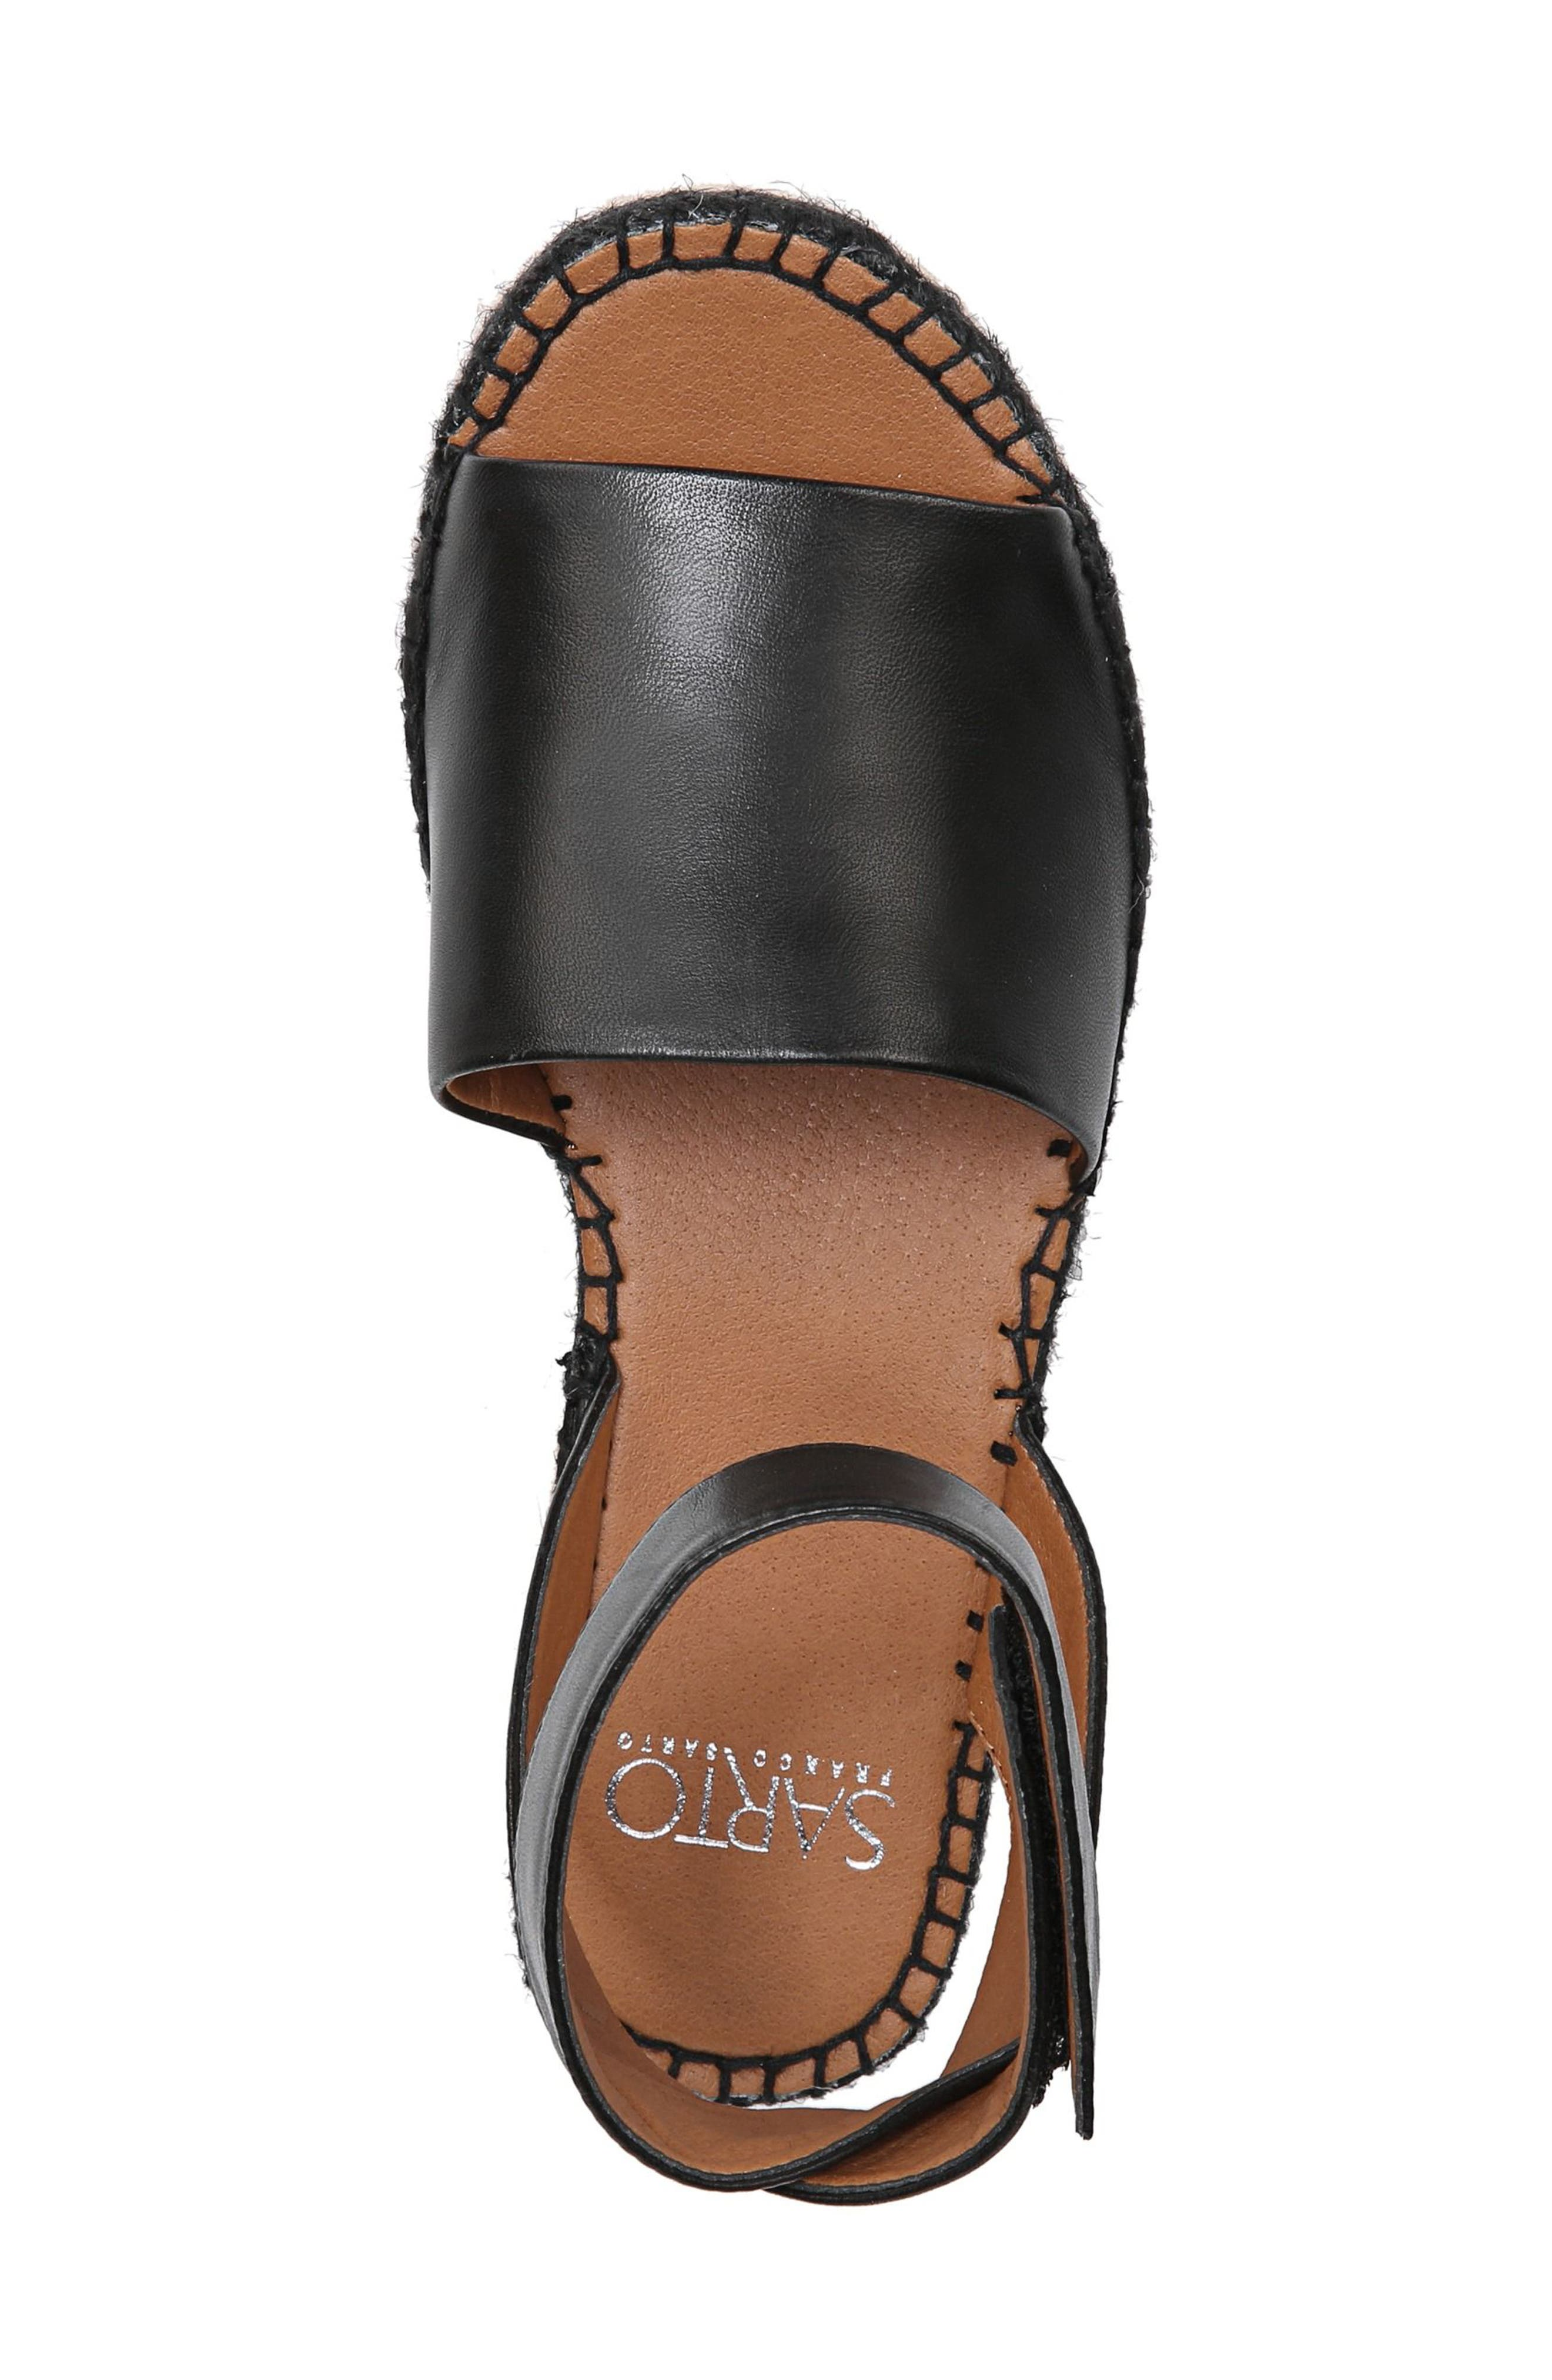 Maisi Platform Espadrille Sandal,                             Alternate thumbnail 5, color,                             BLACK LEATHER